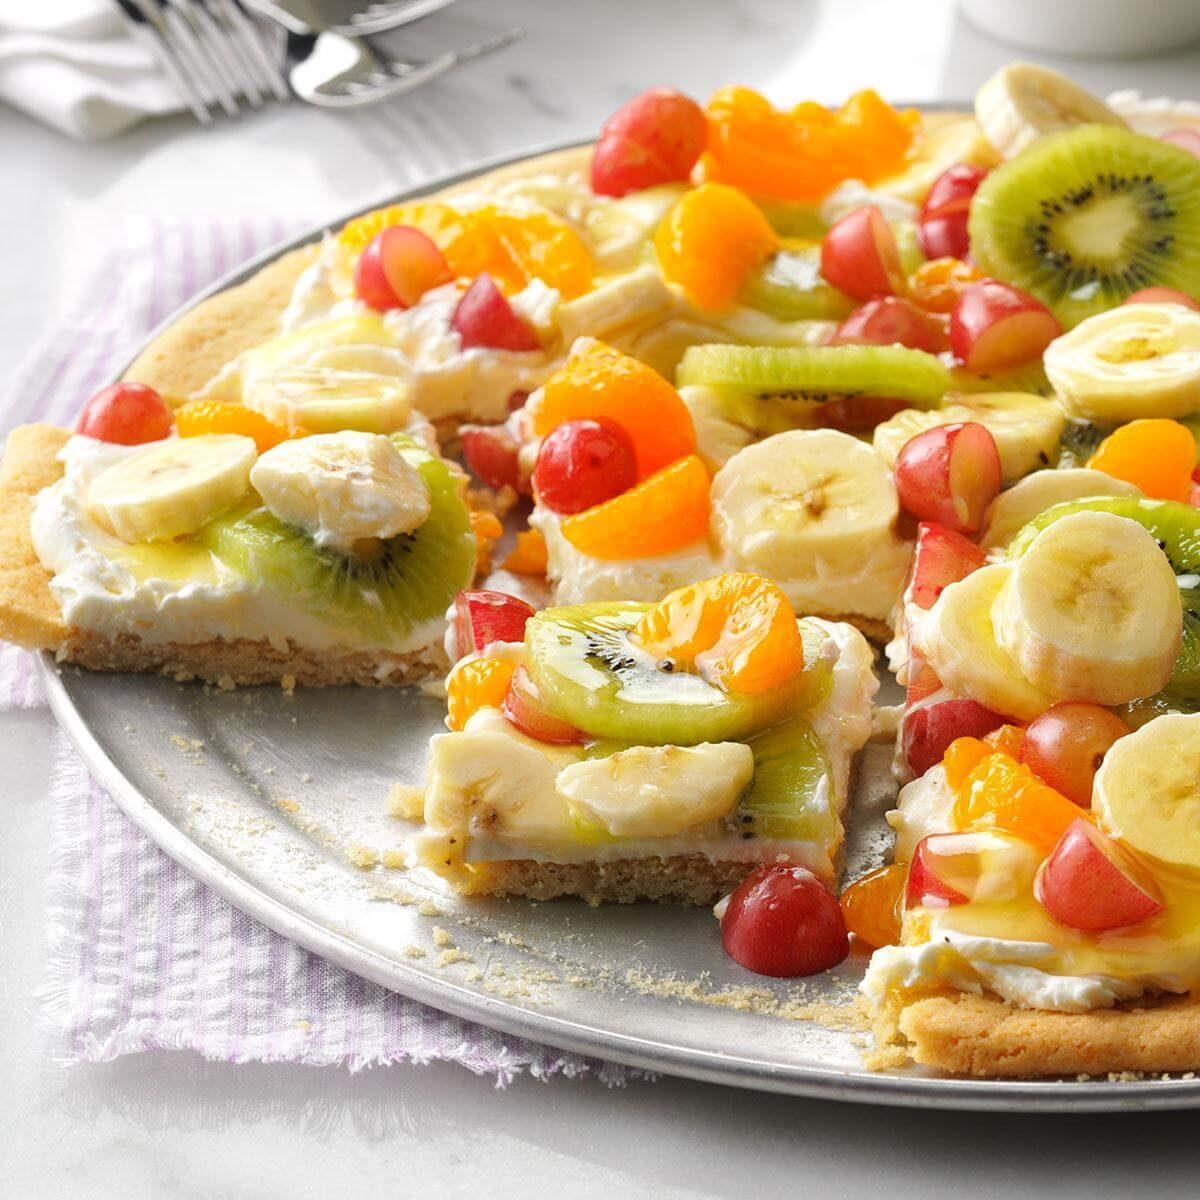 Fruit Pizza with Mandarin Oranges